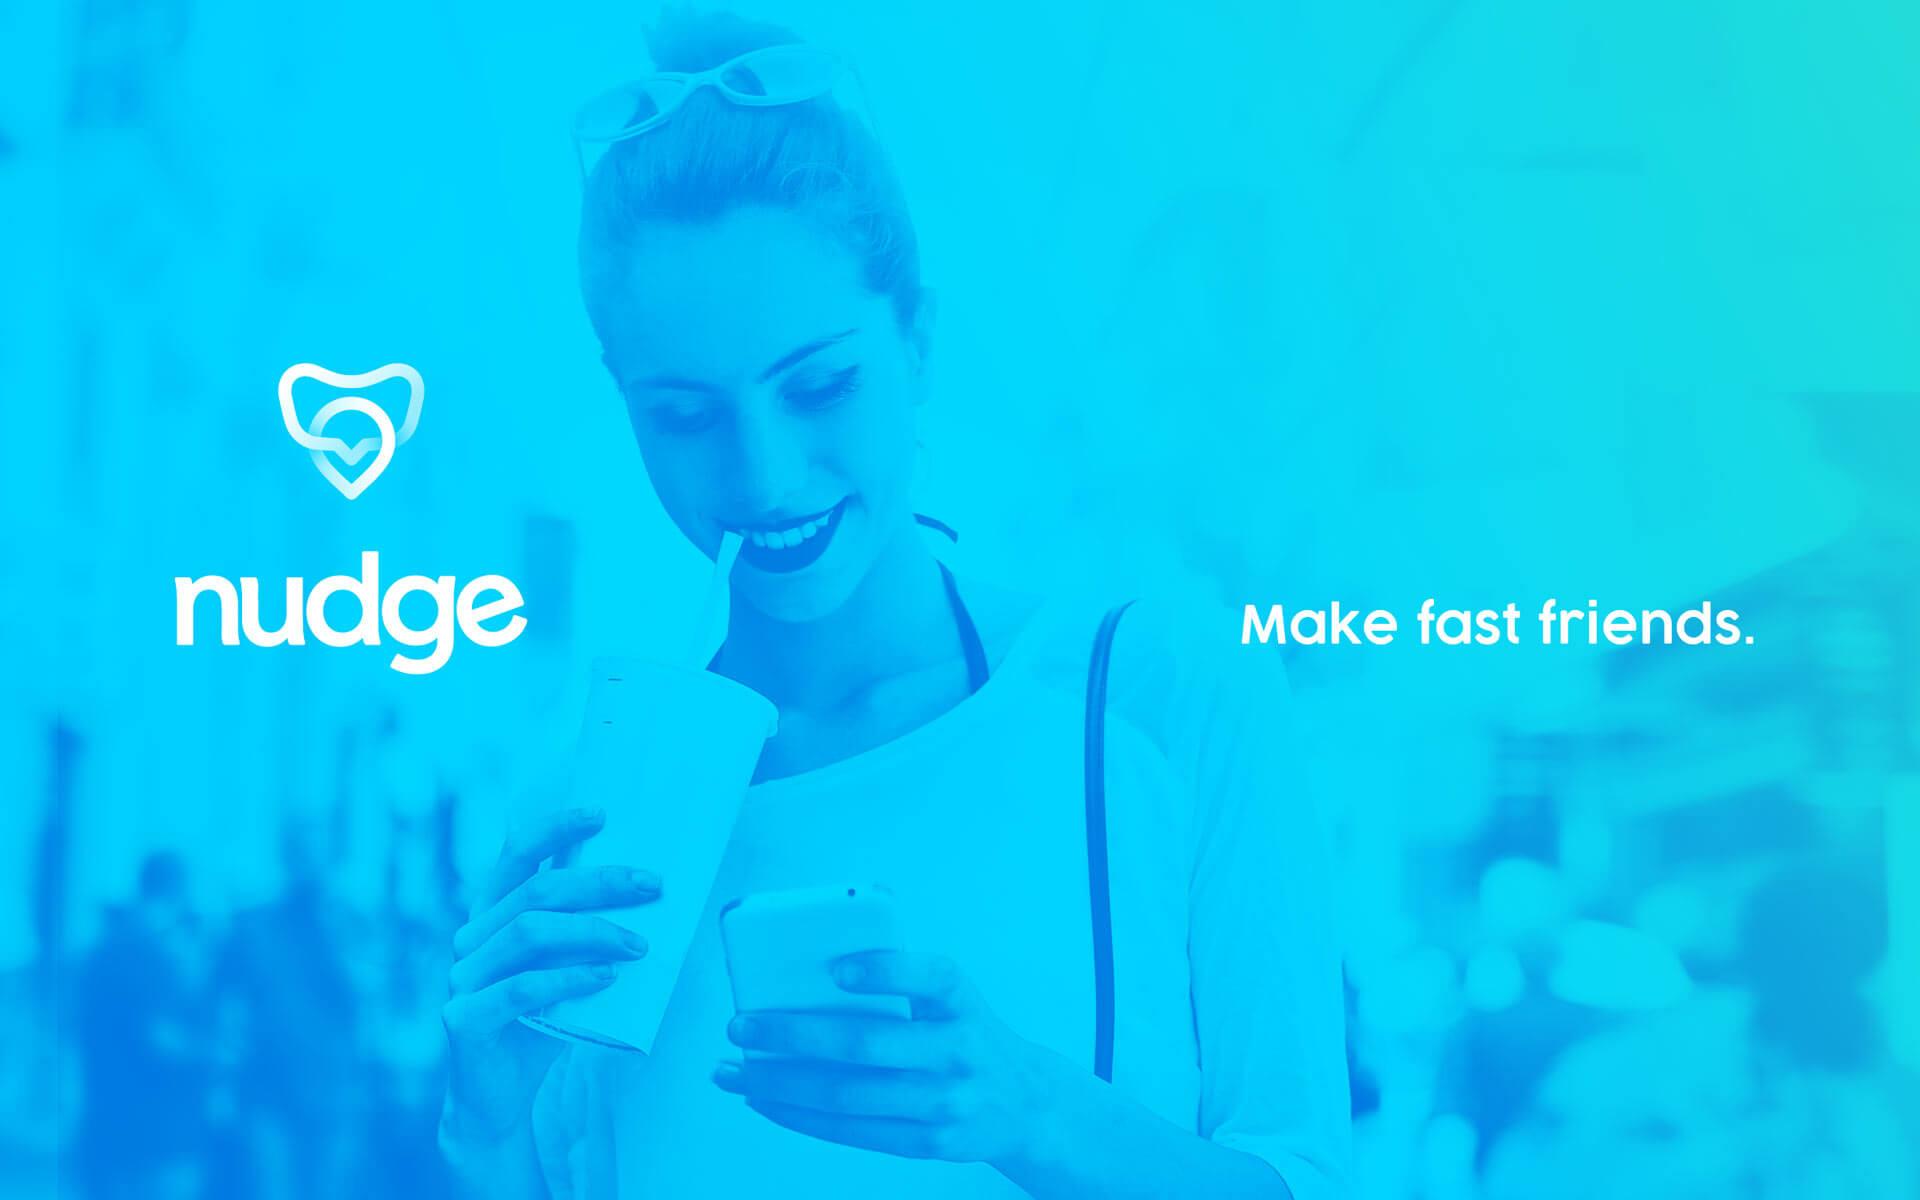 Nudge promo image